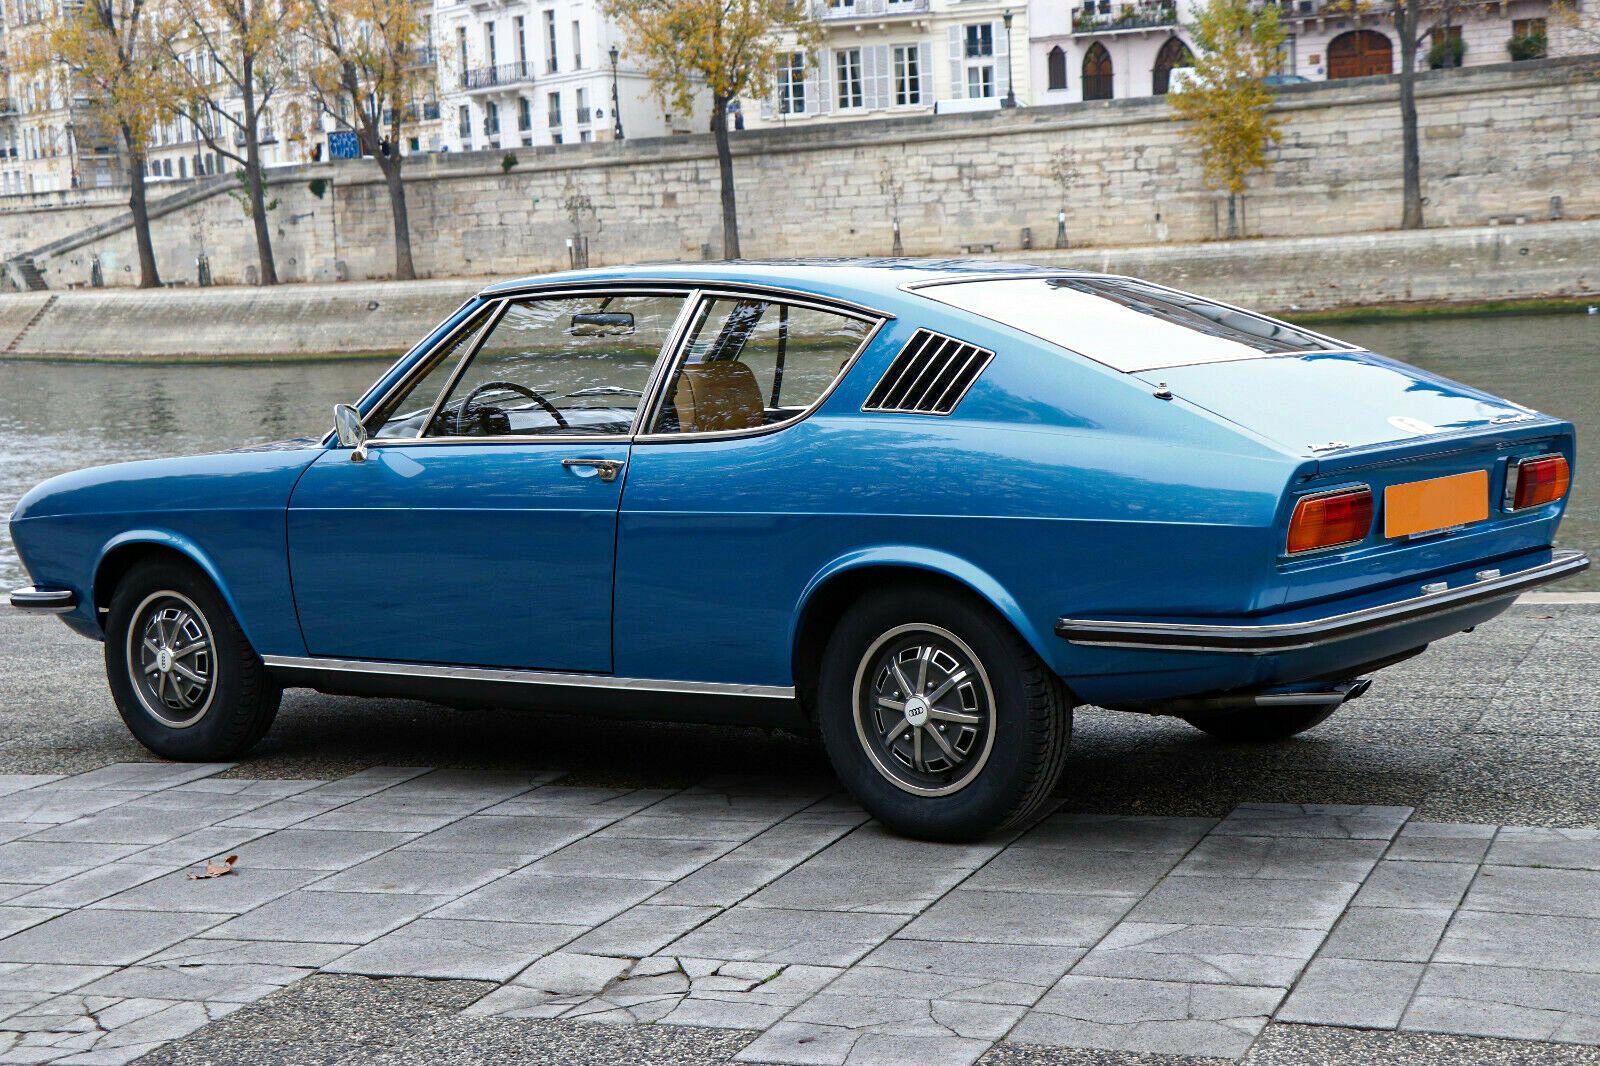 1973 Audi 100 Coupe S in 2020 (mit Bildern)